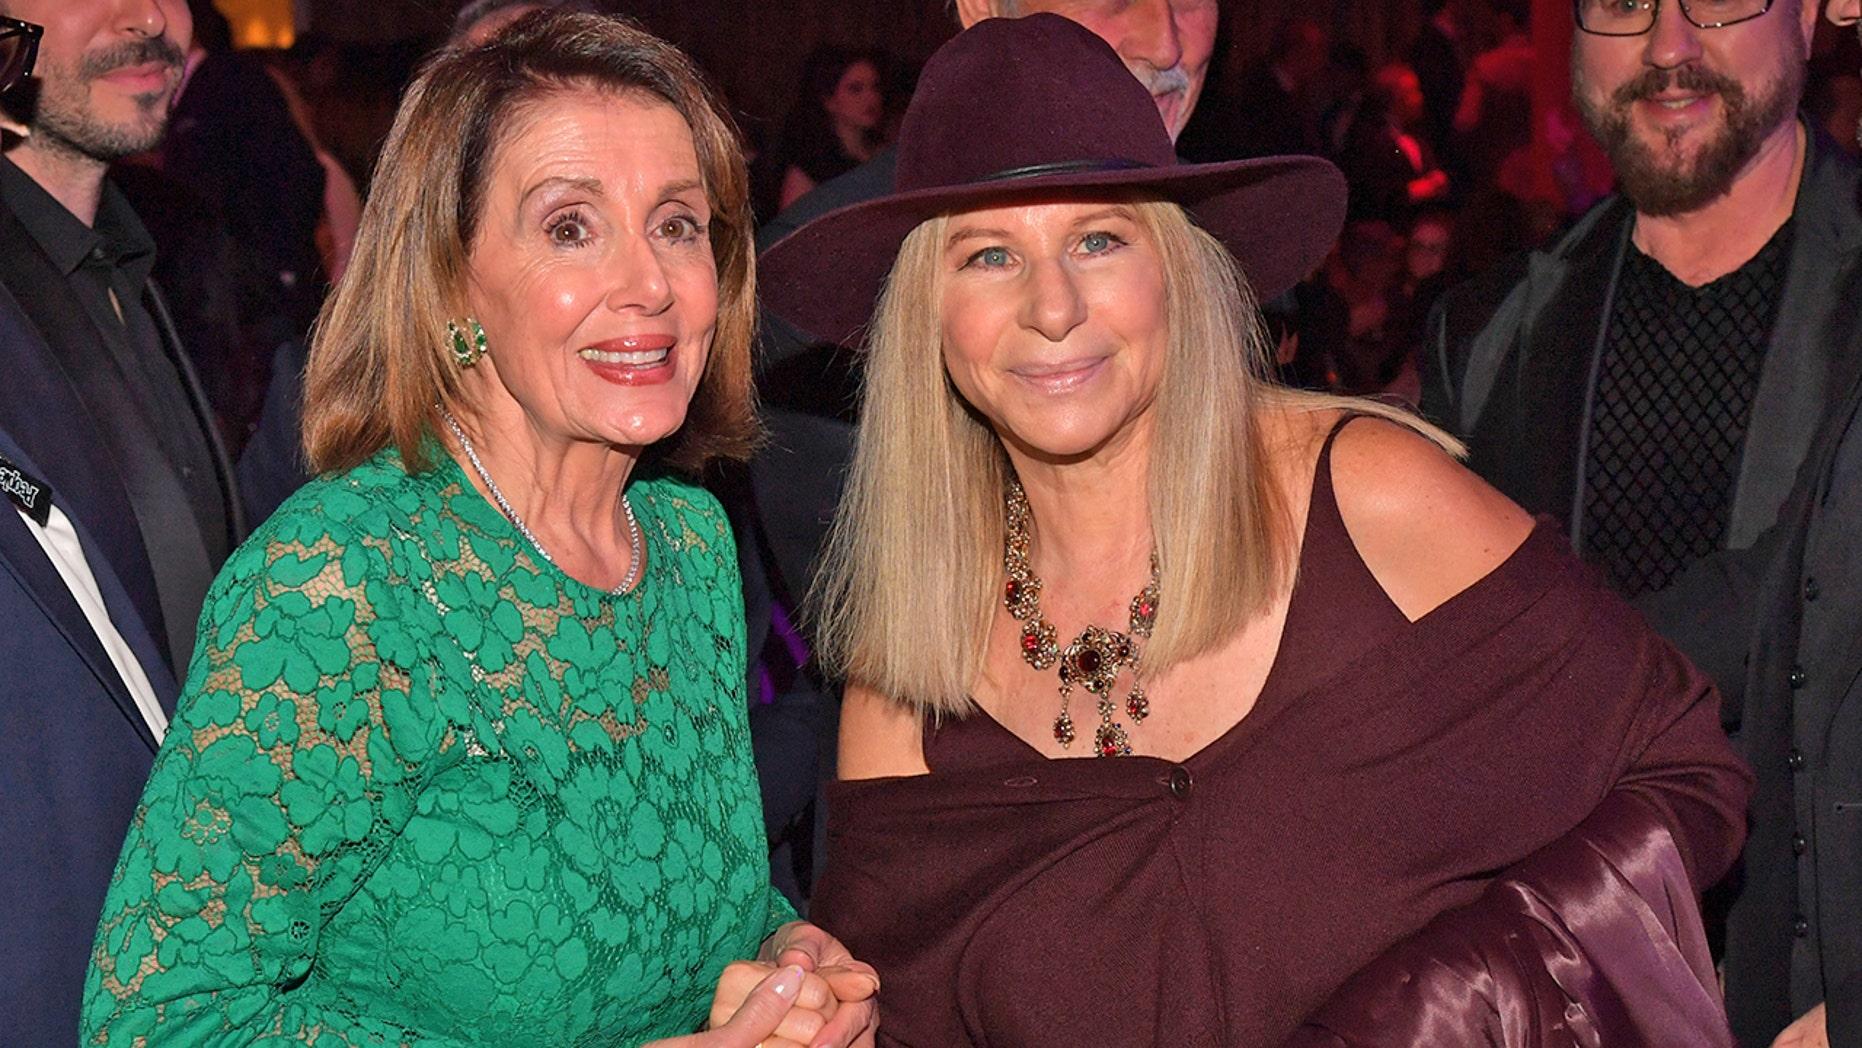 Nancy Pelosi and Barbra Streisand